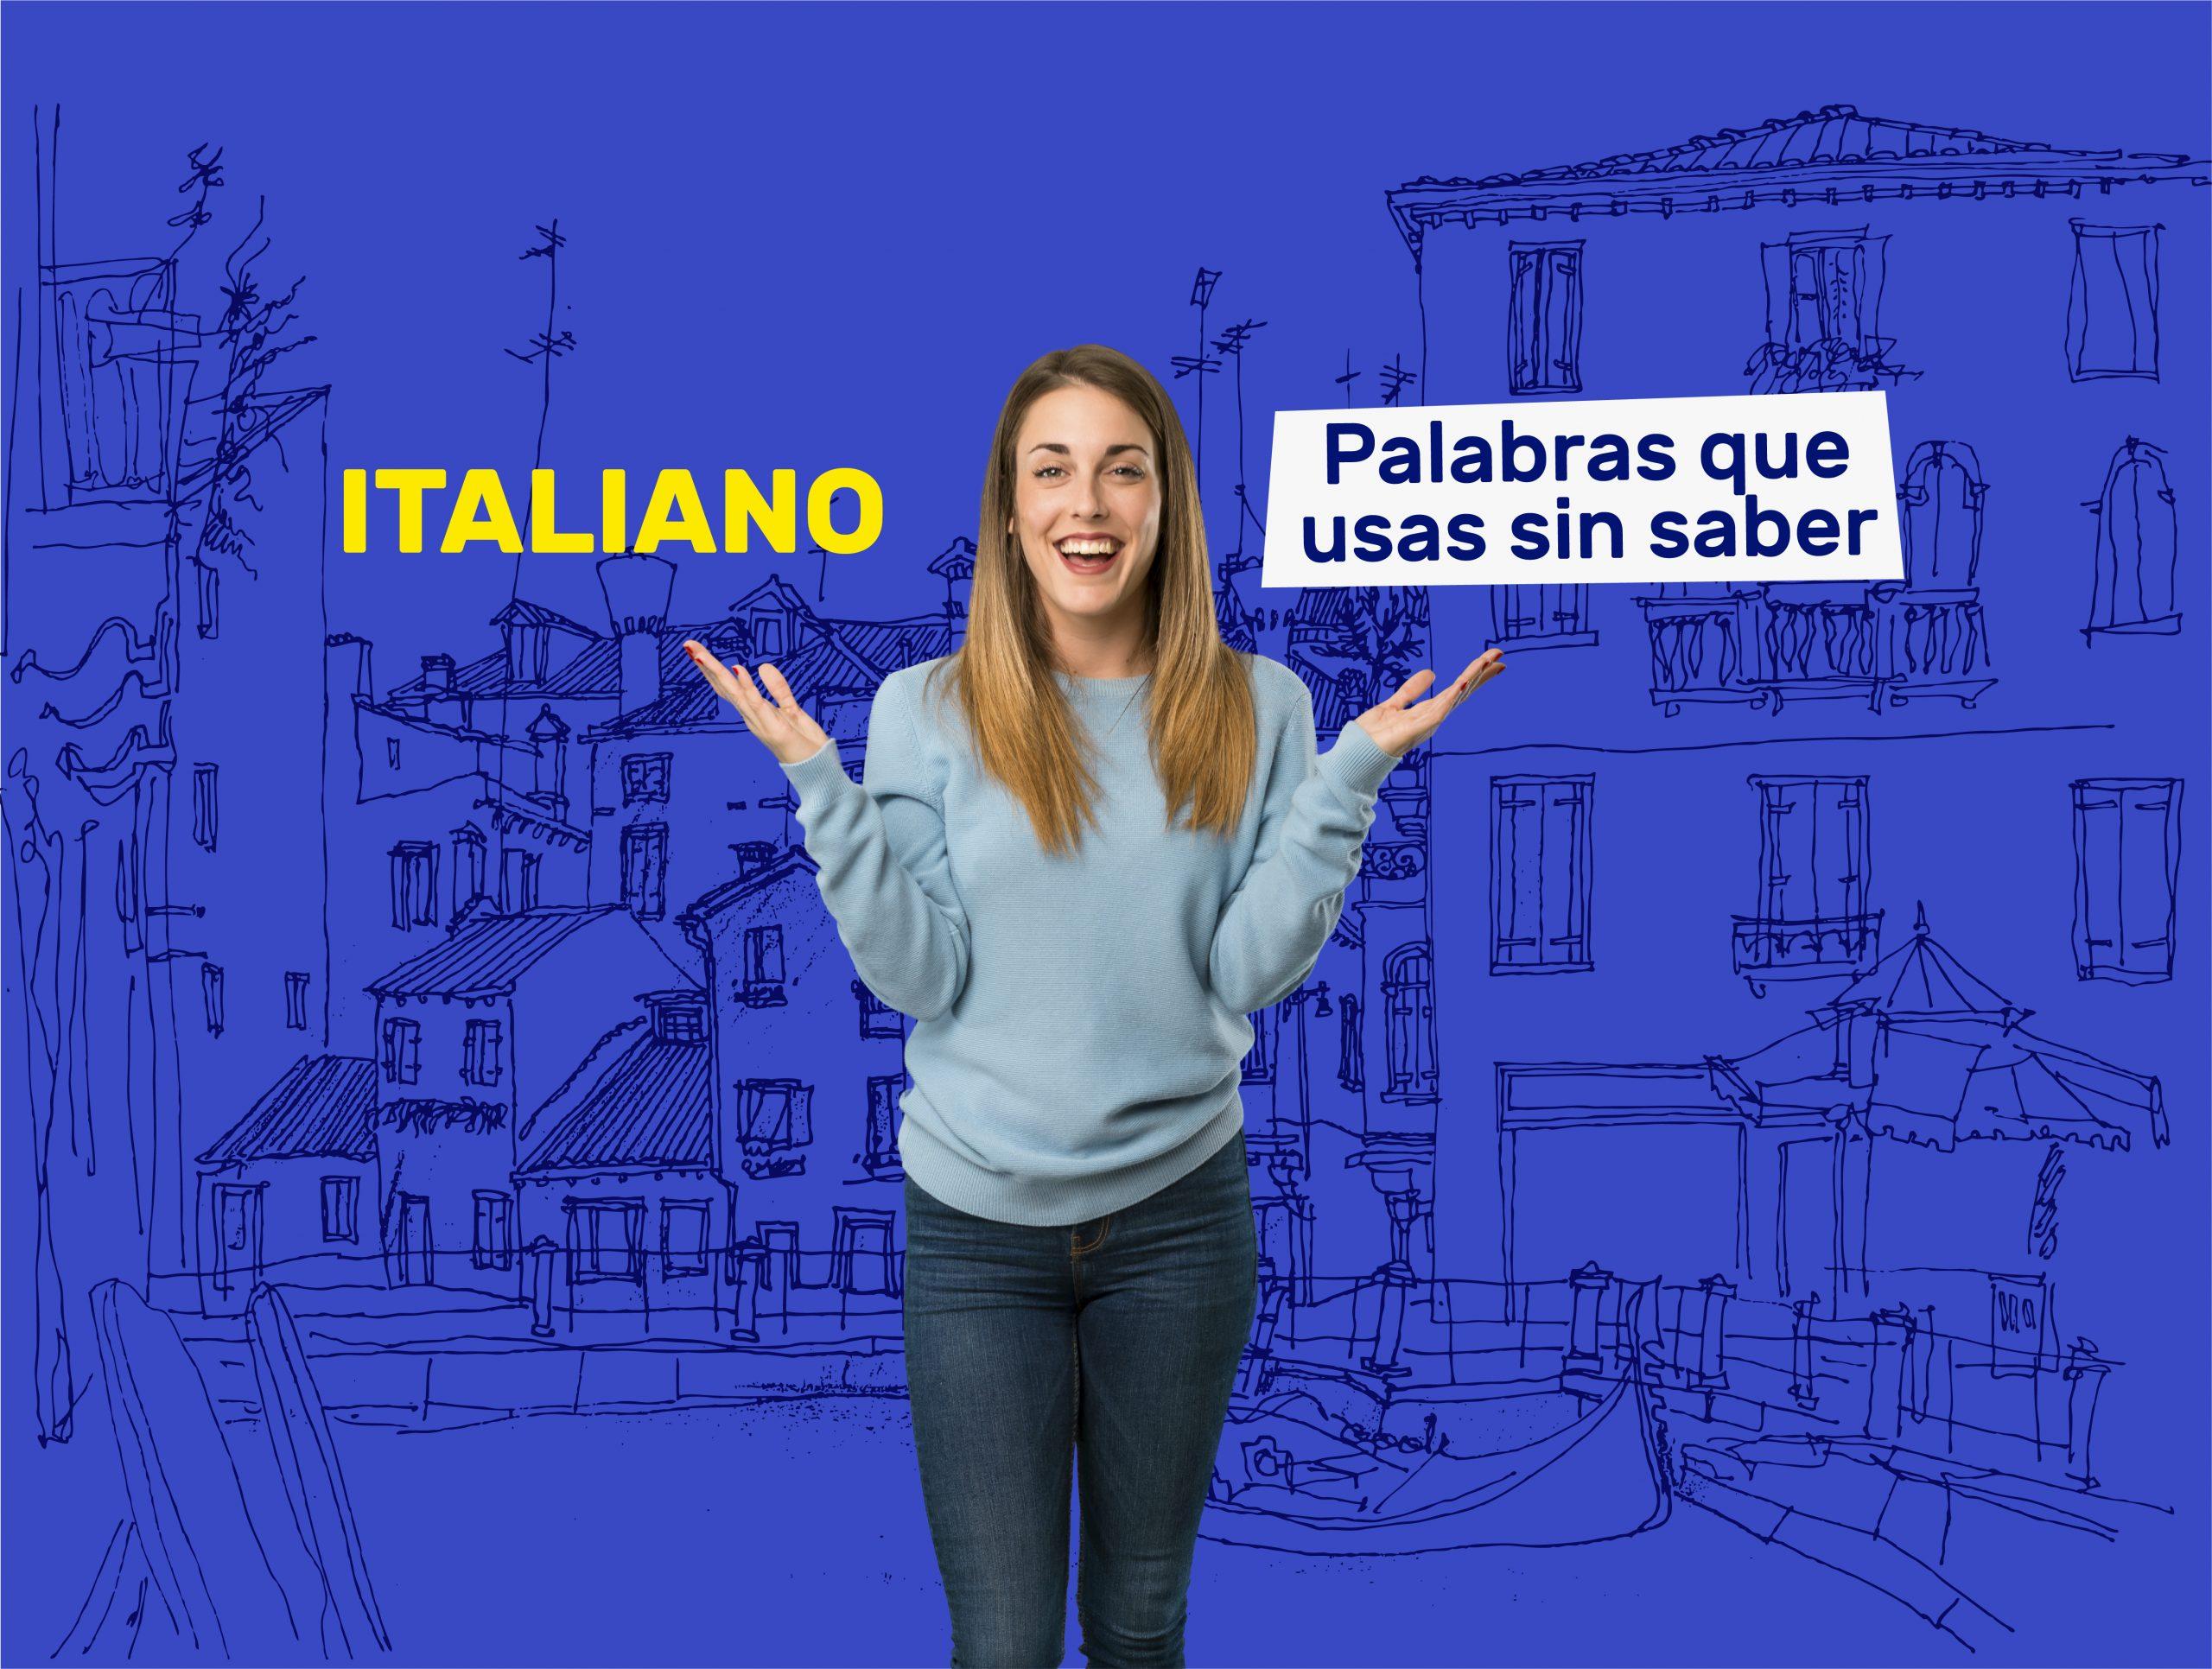 palabras en idioma italiano